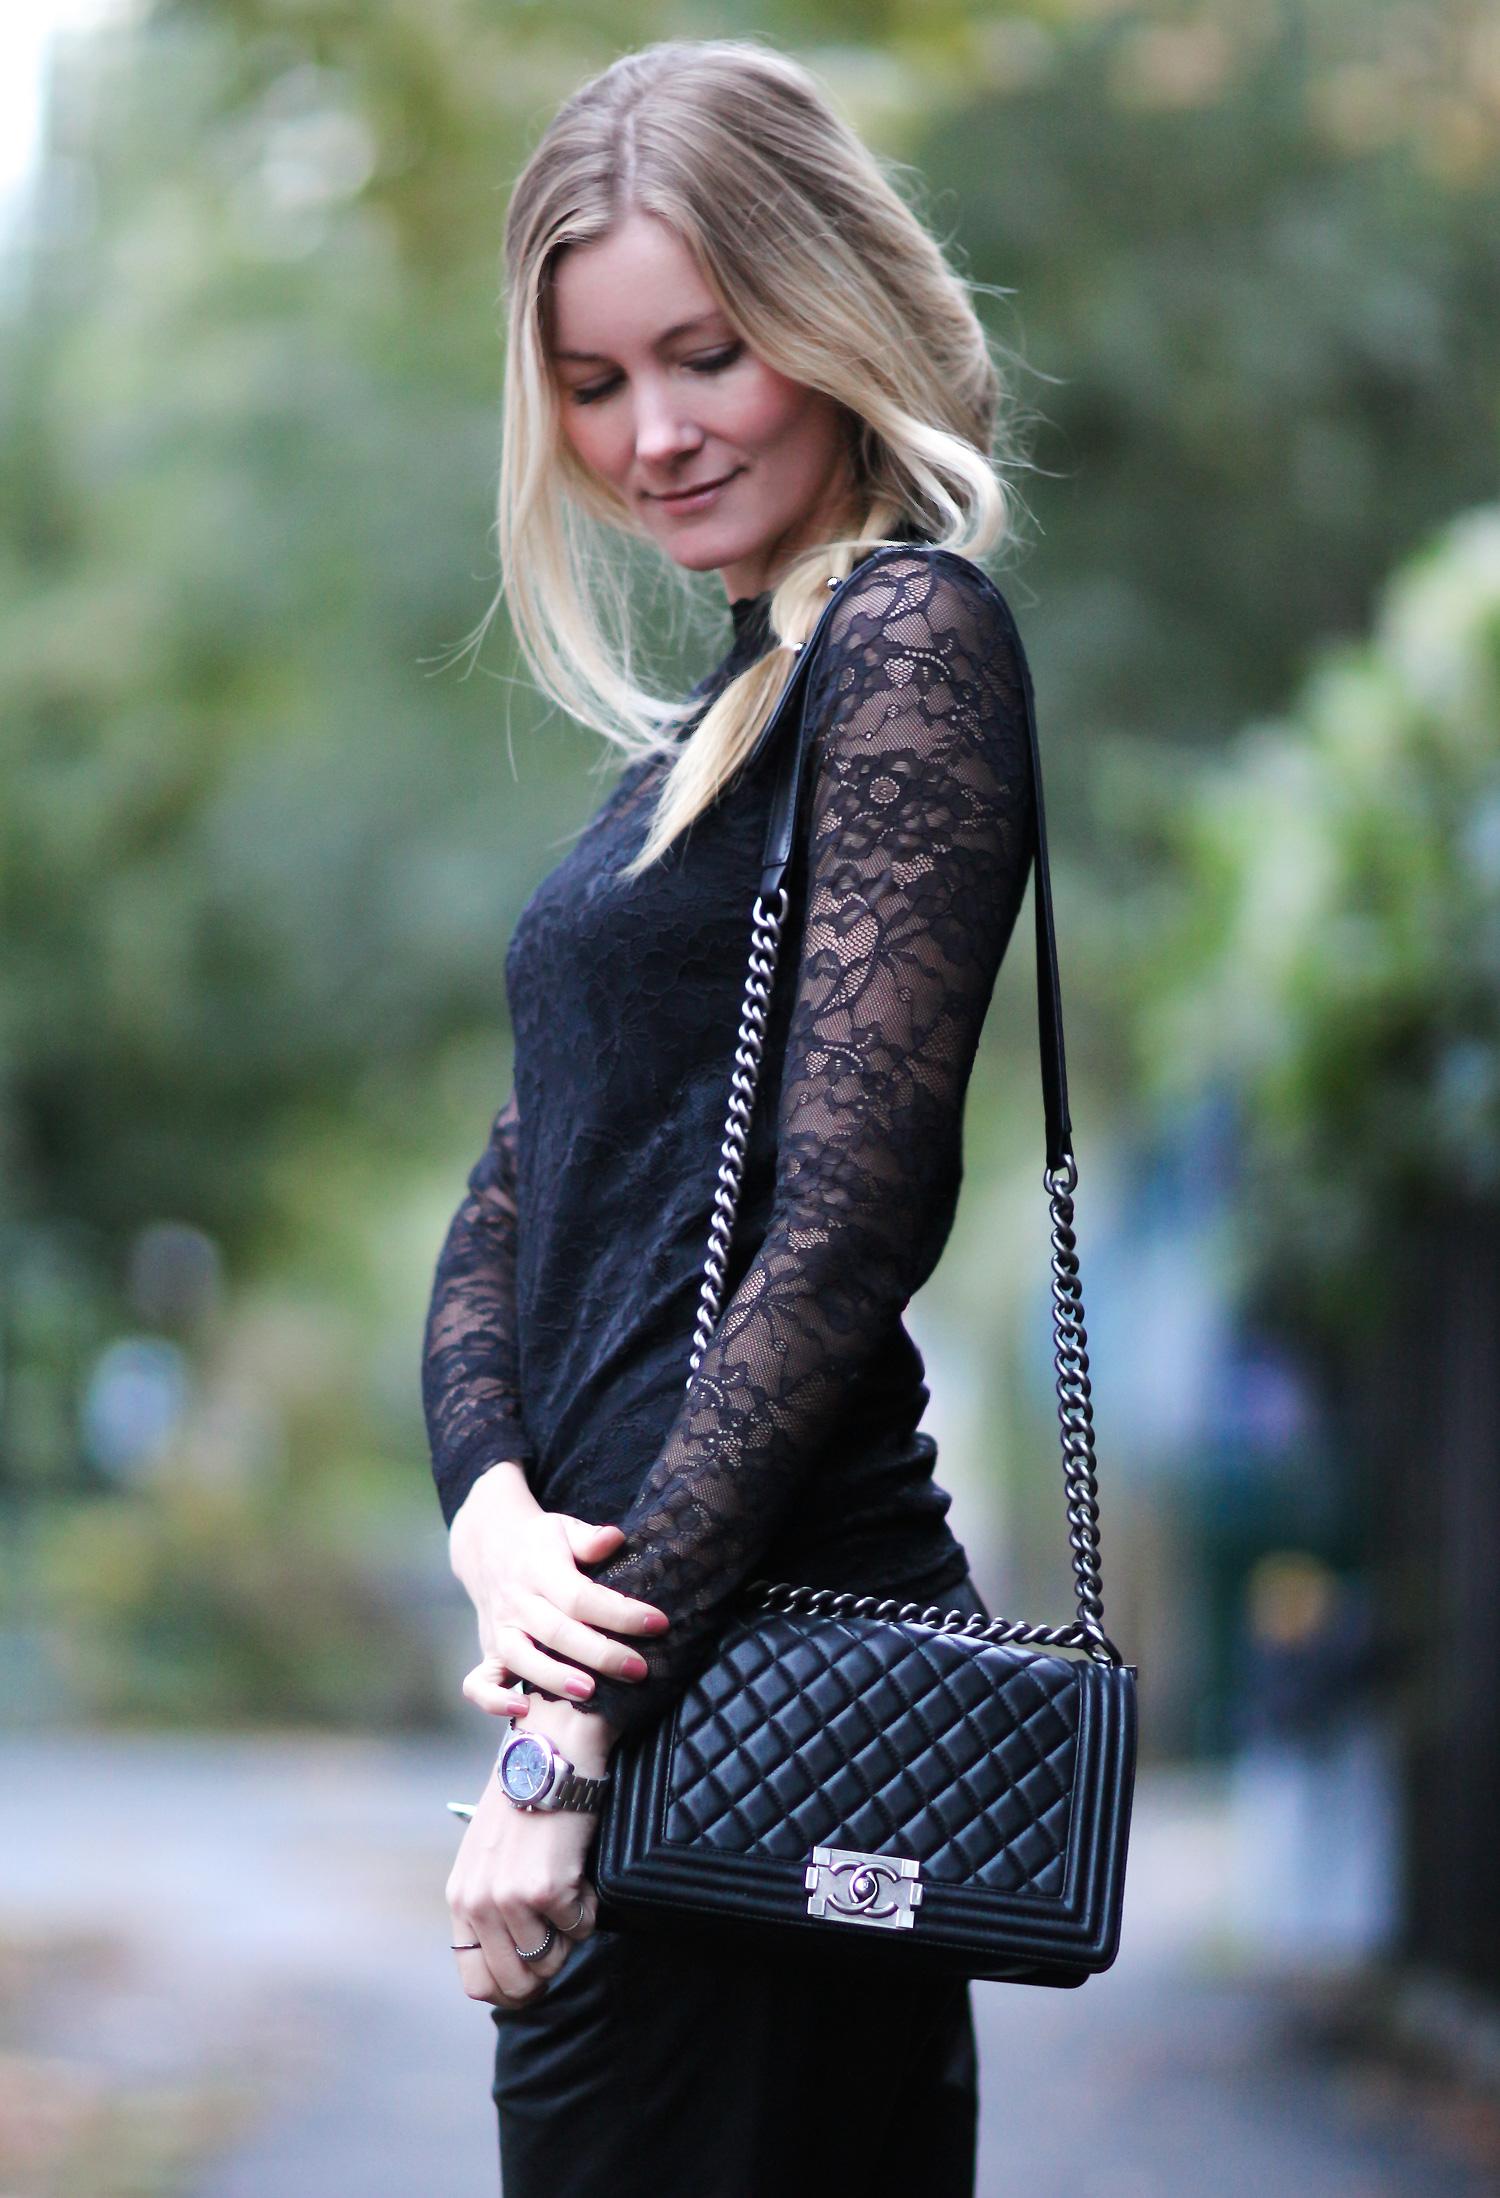 blonde-top@2x